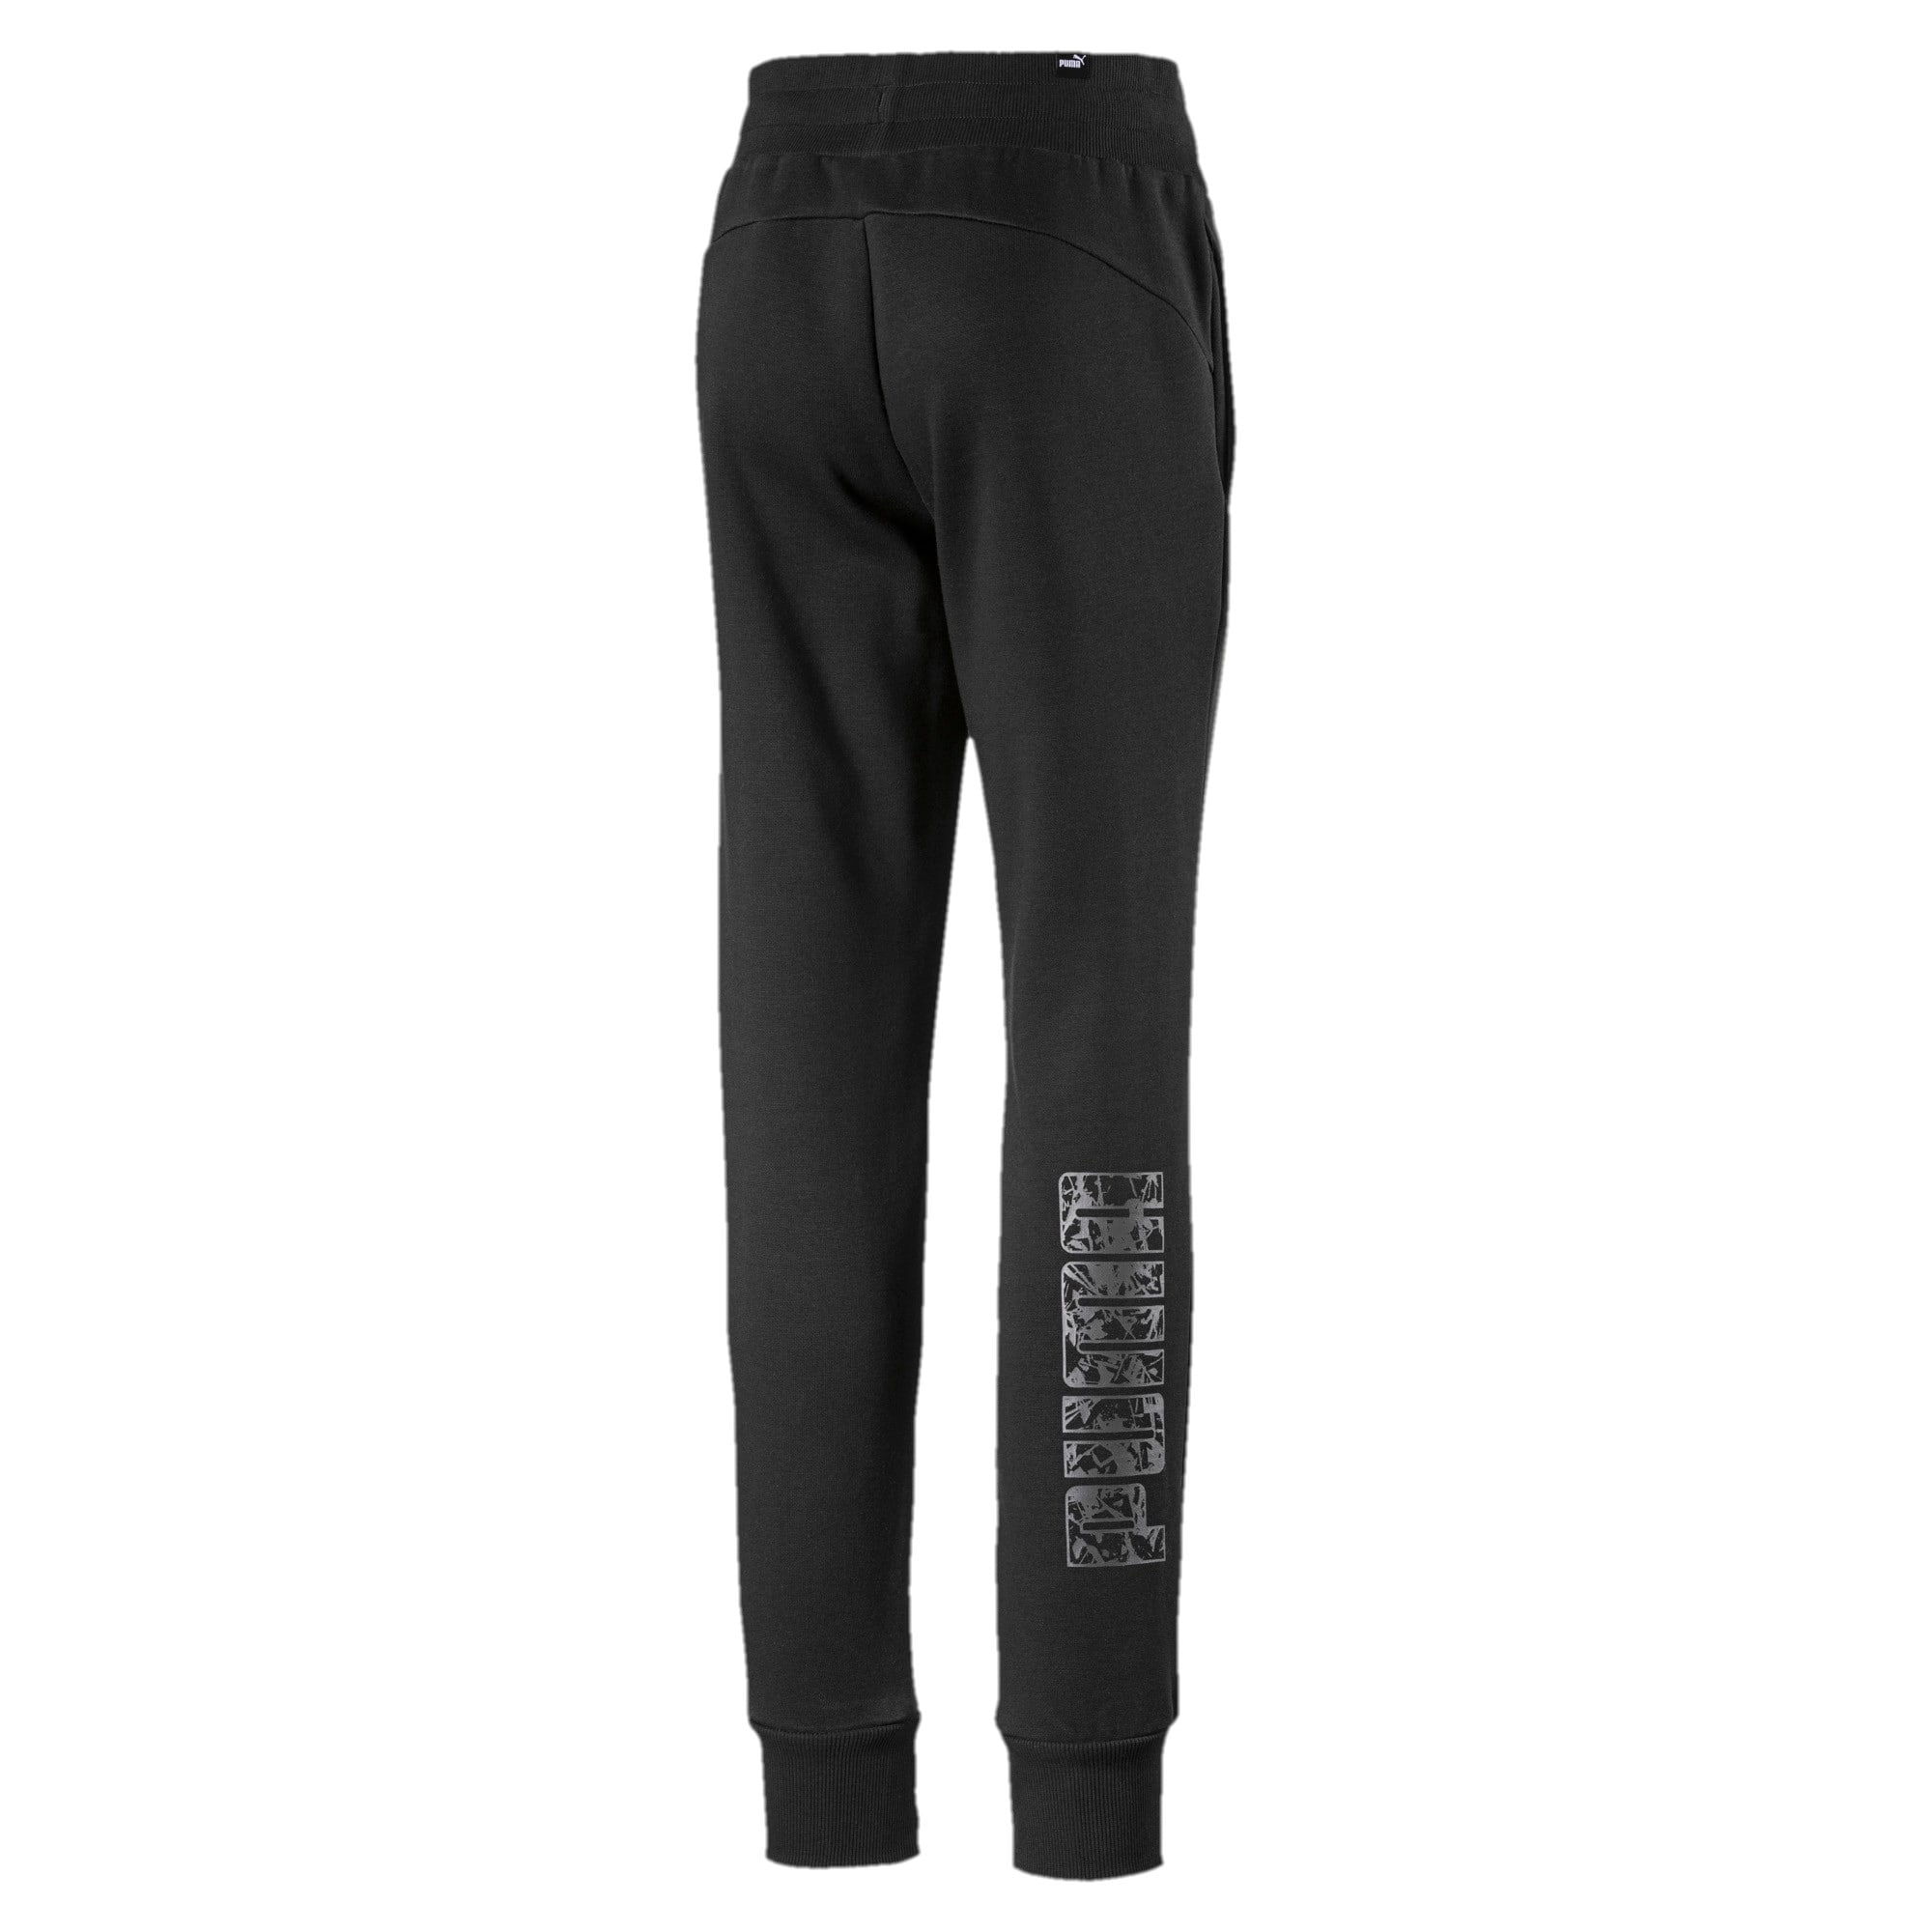 Thumbnail 2 of Girls' Sweatpants, Puma Black, medium-IND